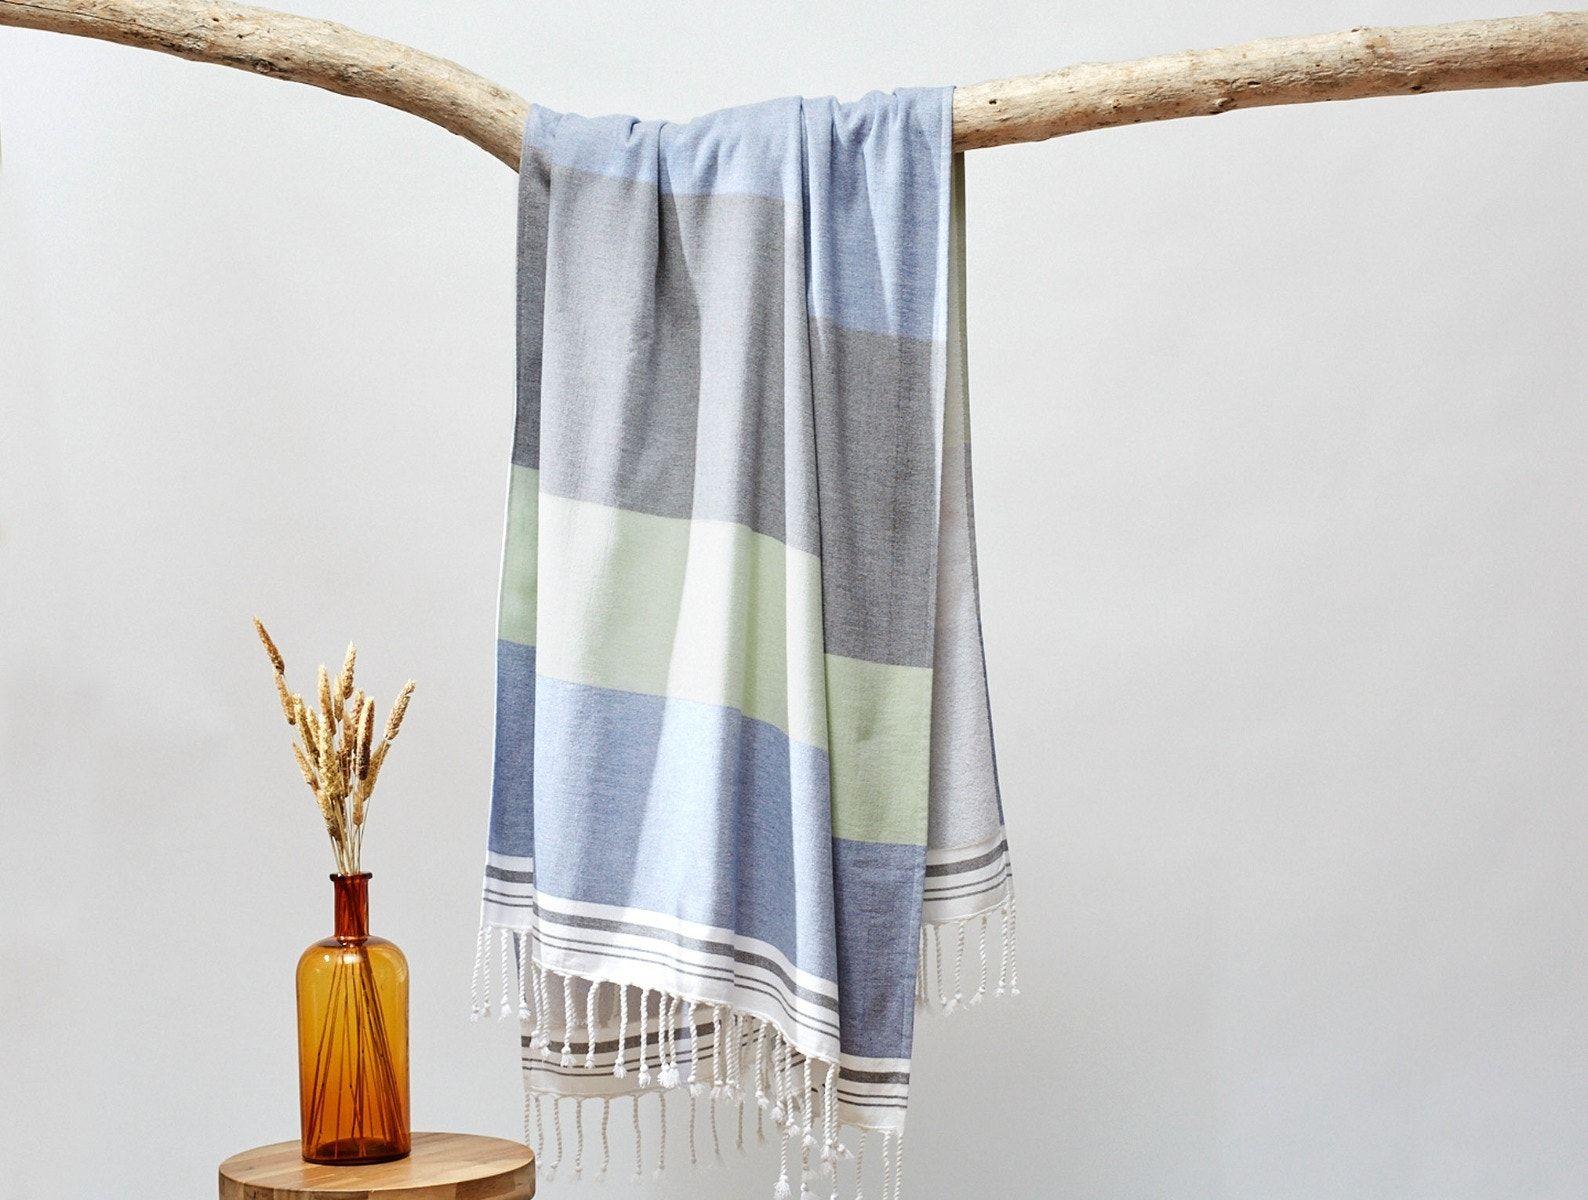 Malibu Organic Beach Towels